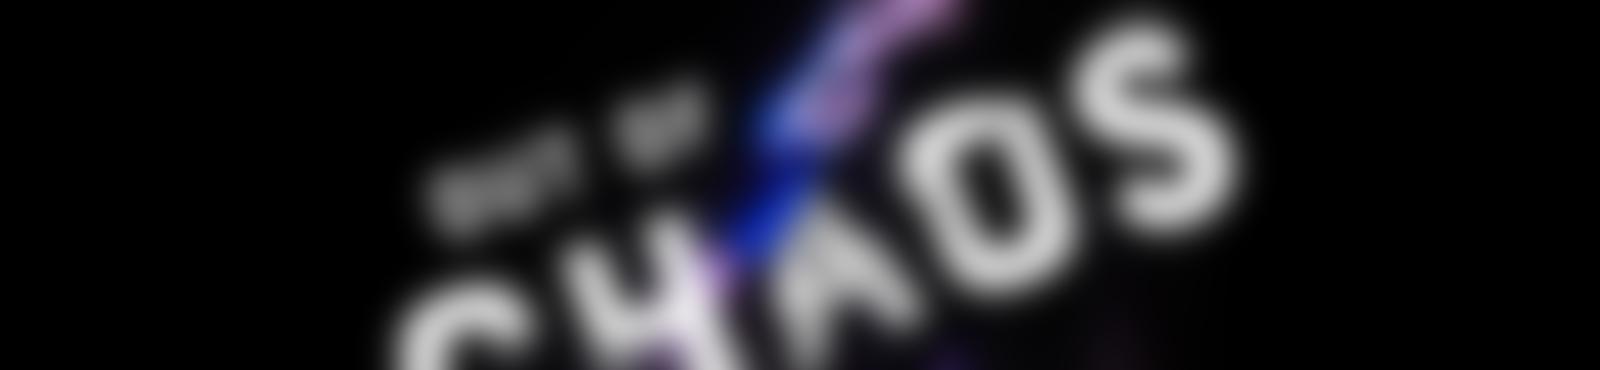 Blurred 393e5c62 21cd 4360 b62d 8d25604c66e2